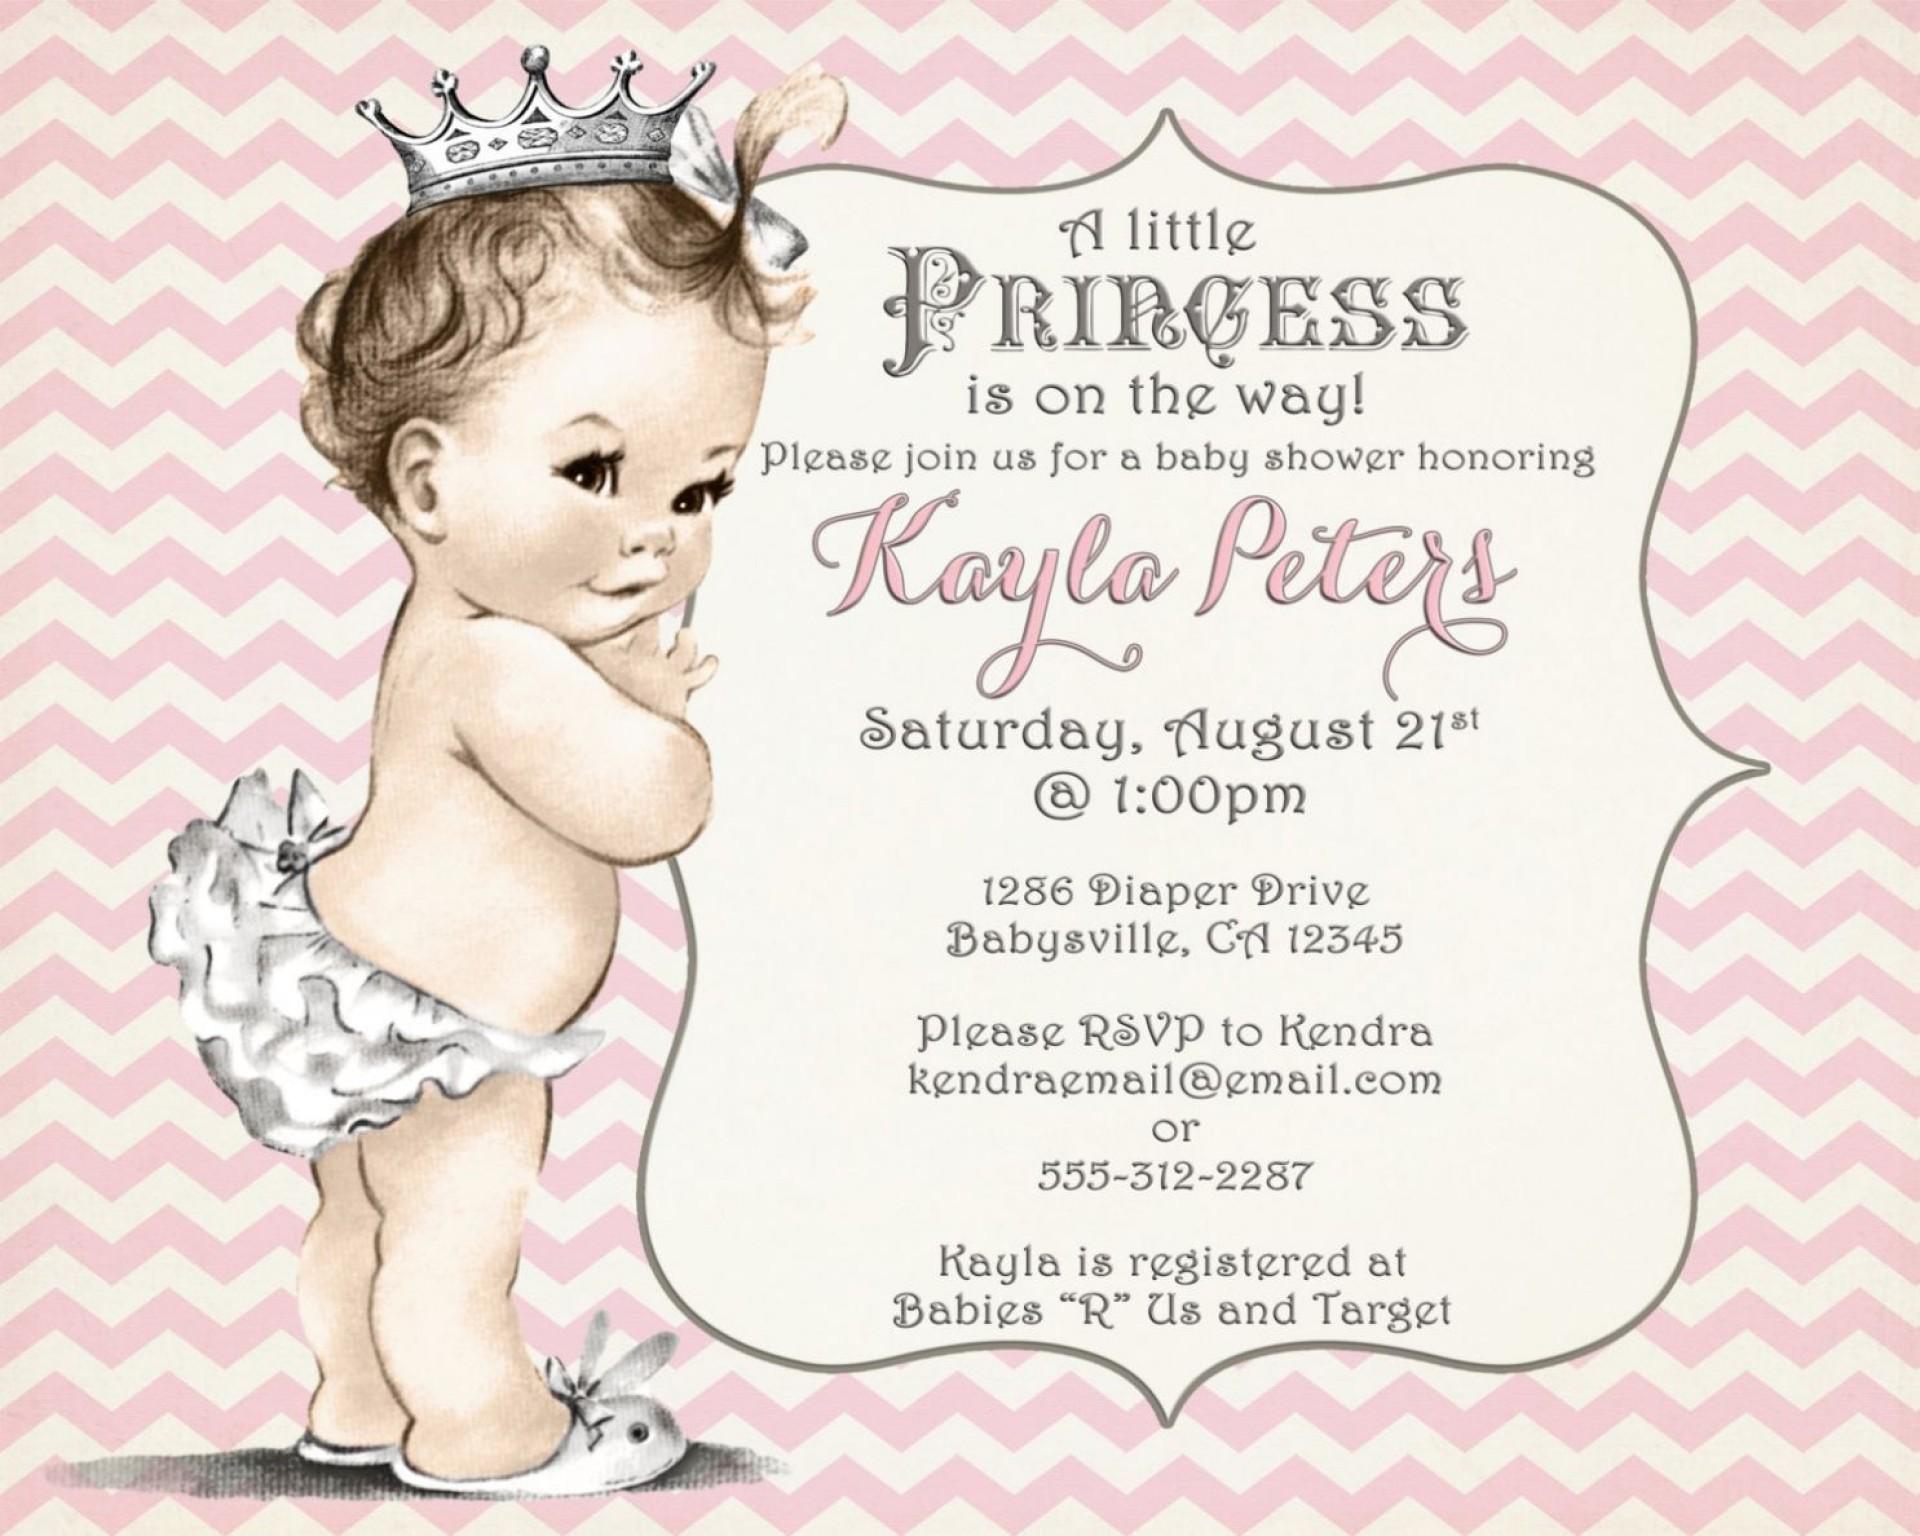 000 Unusual Princes Baby Shower Invitation Template Idea  Templates Little Royal Red Disney1920